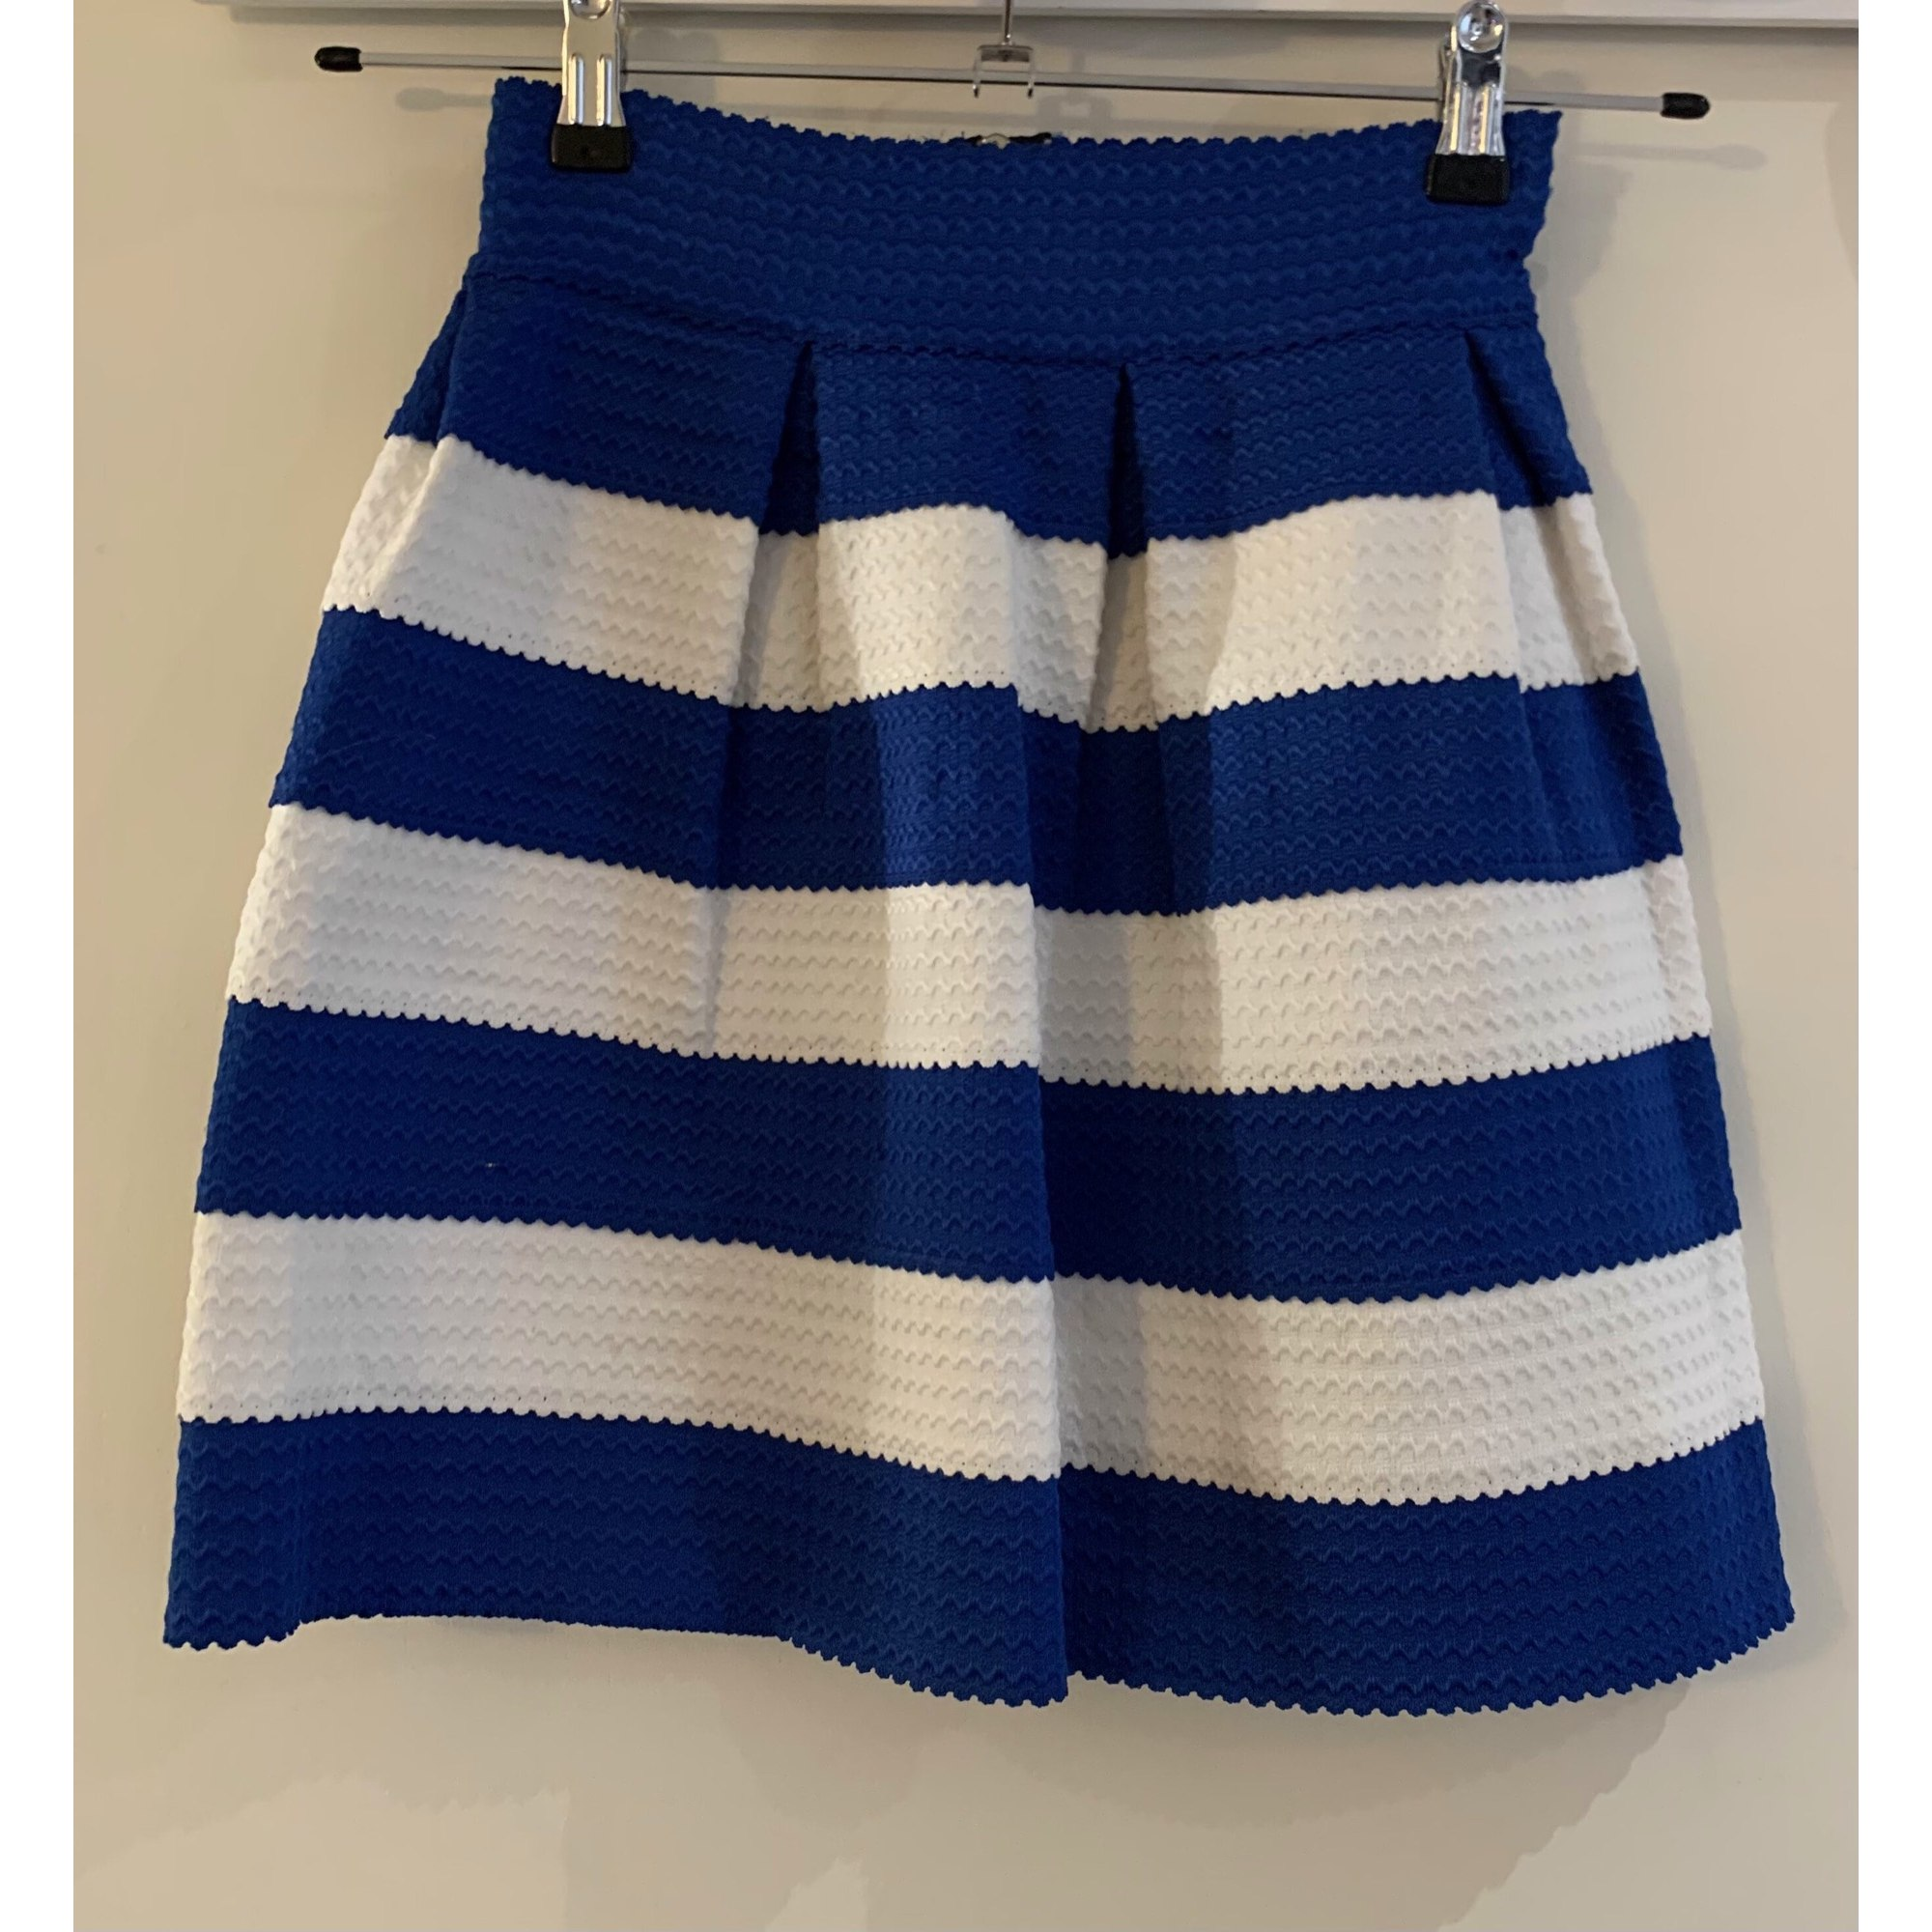 Jupe courte MARQUE INCONNUE Bleu, bleu marine, bleu turquoise